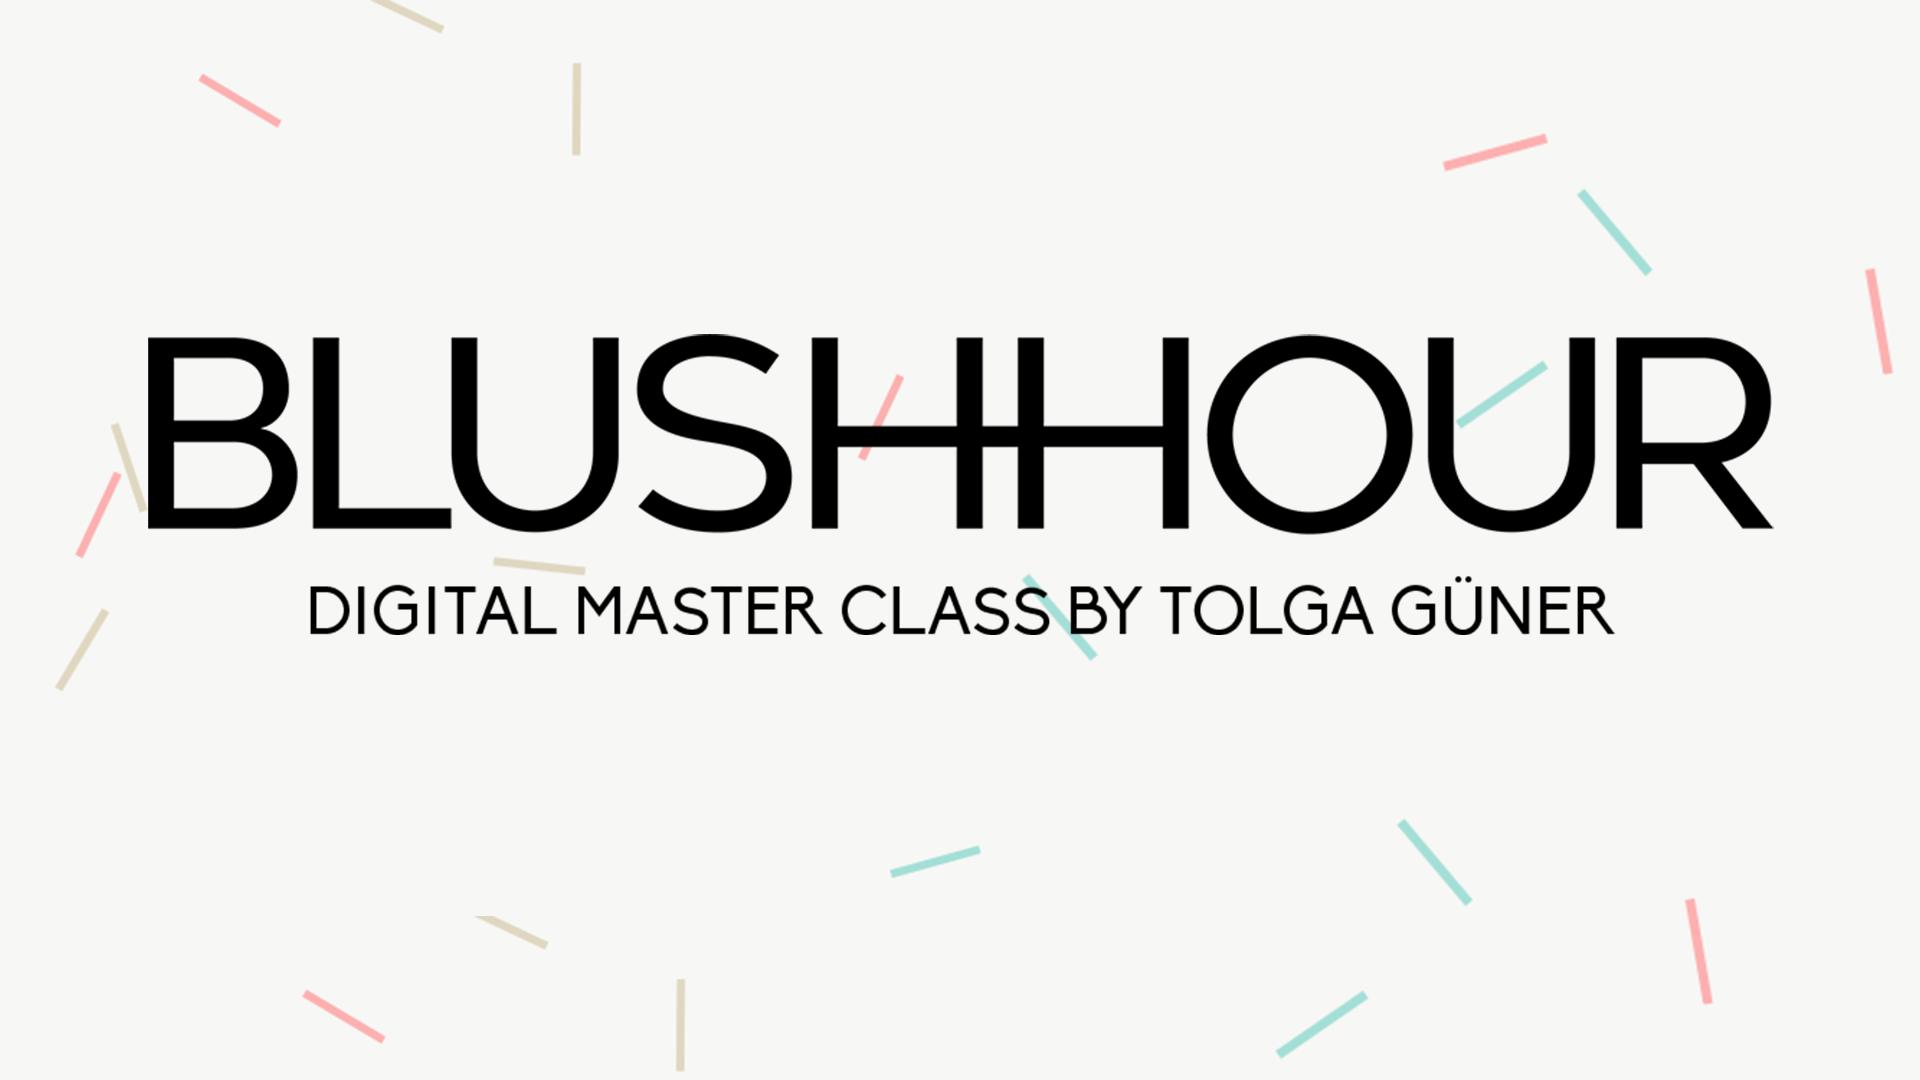 BLUSHHOUR DIGITAL MASTER CLASS BY TOLGA GÜNER Partnerprogramm